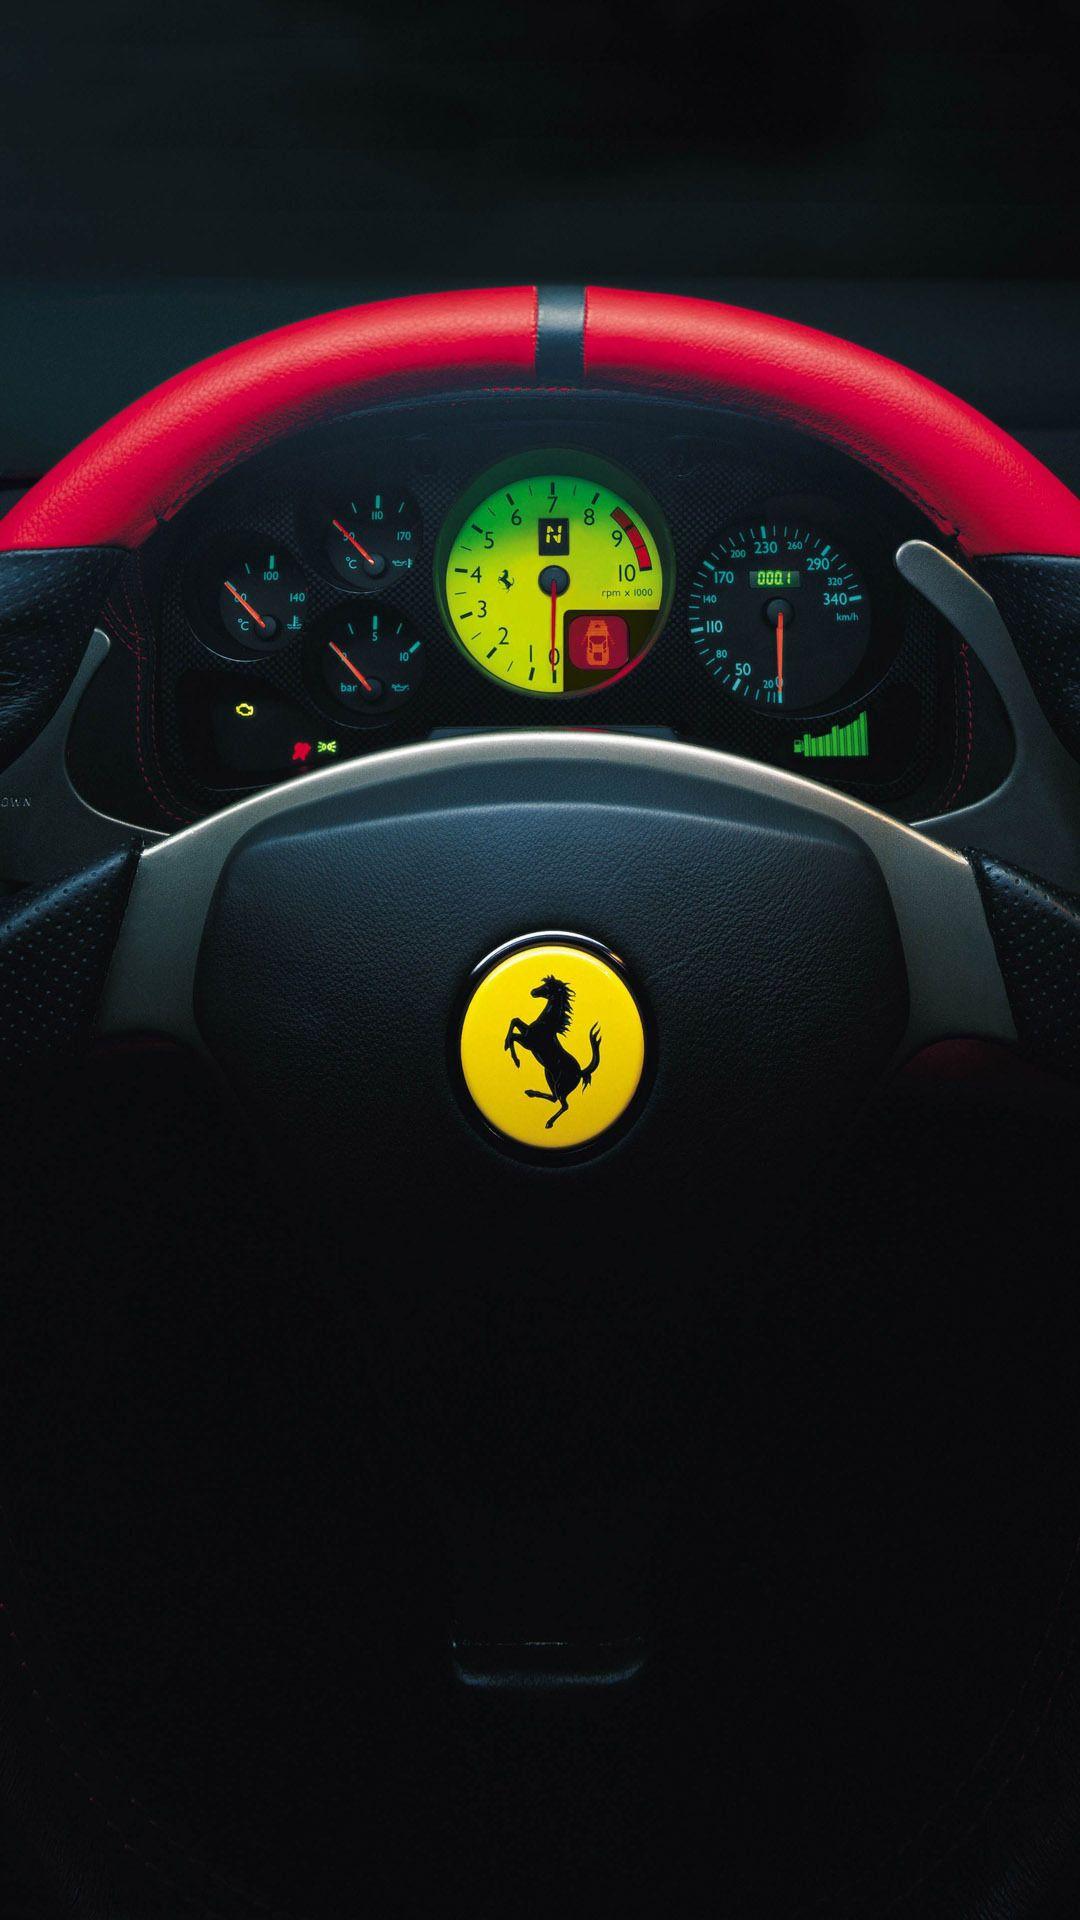 Cars Ferrari 360 Challenge Stradale Dashboard Android Wallpaper